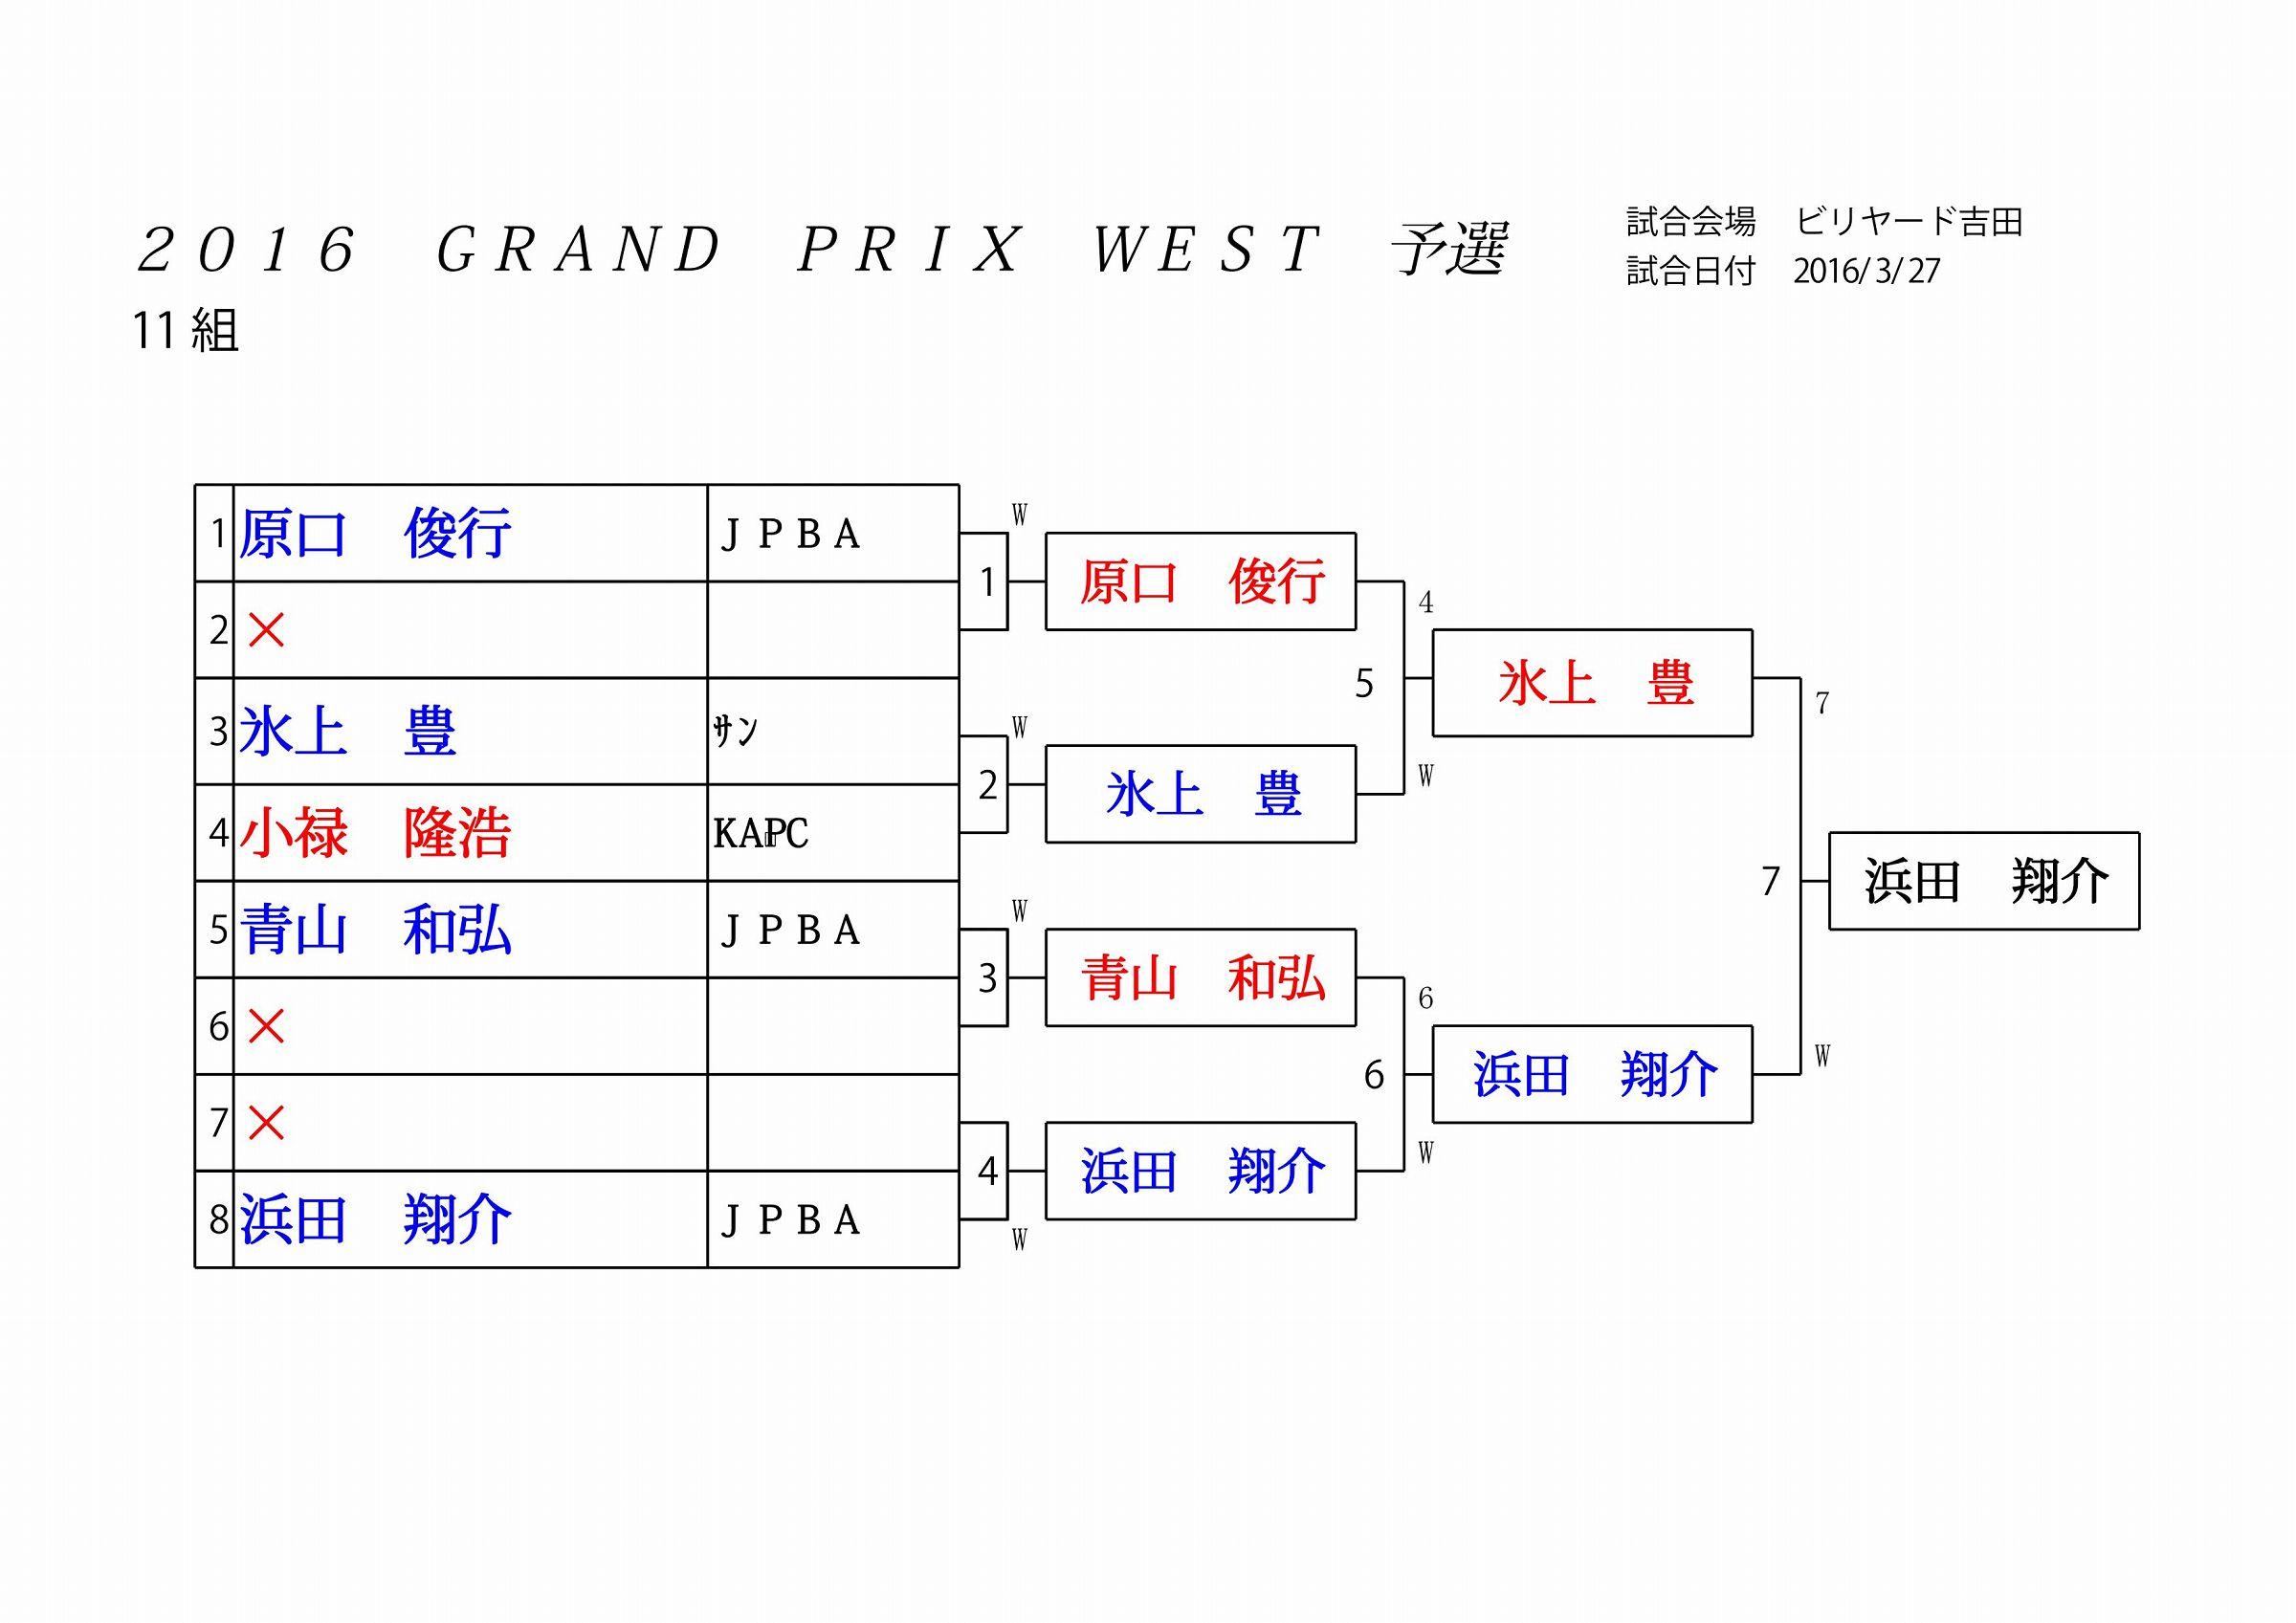 2016 GRAND PRIX WEST 予選_11